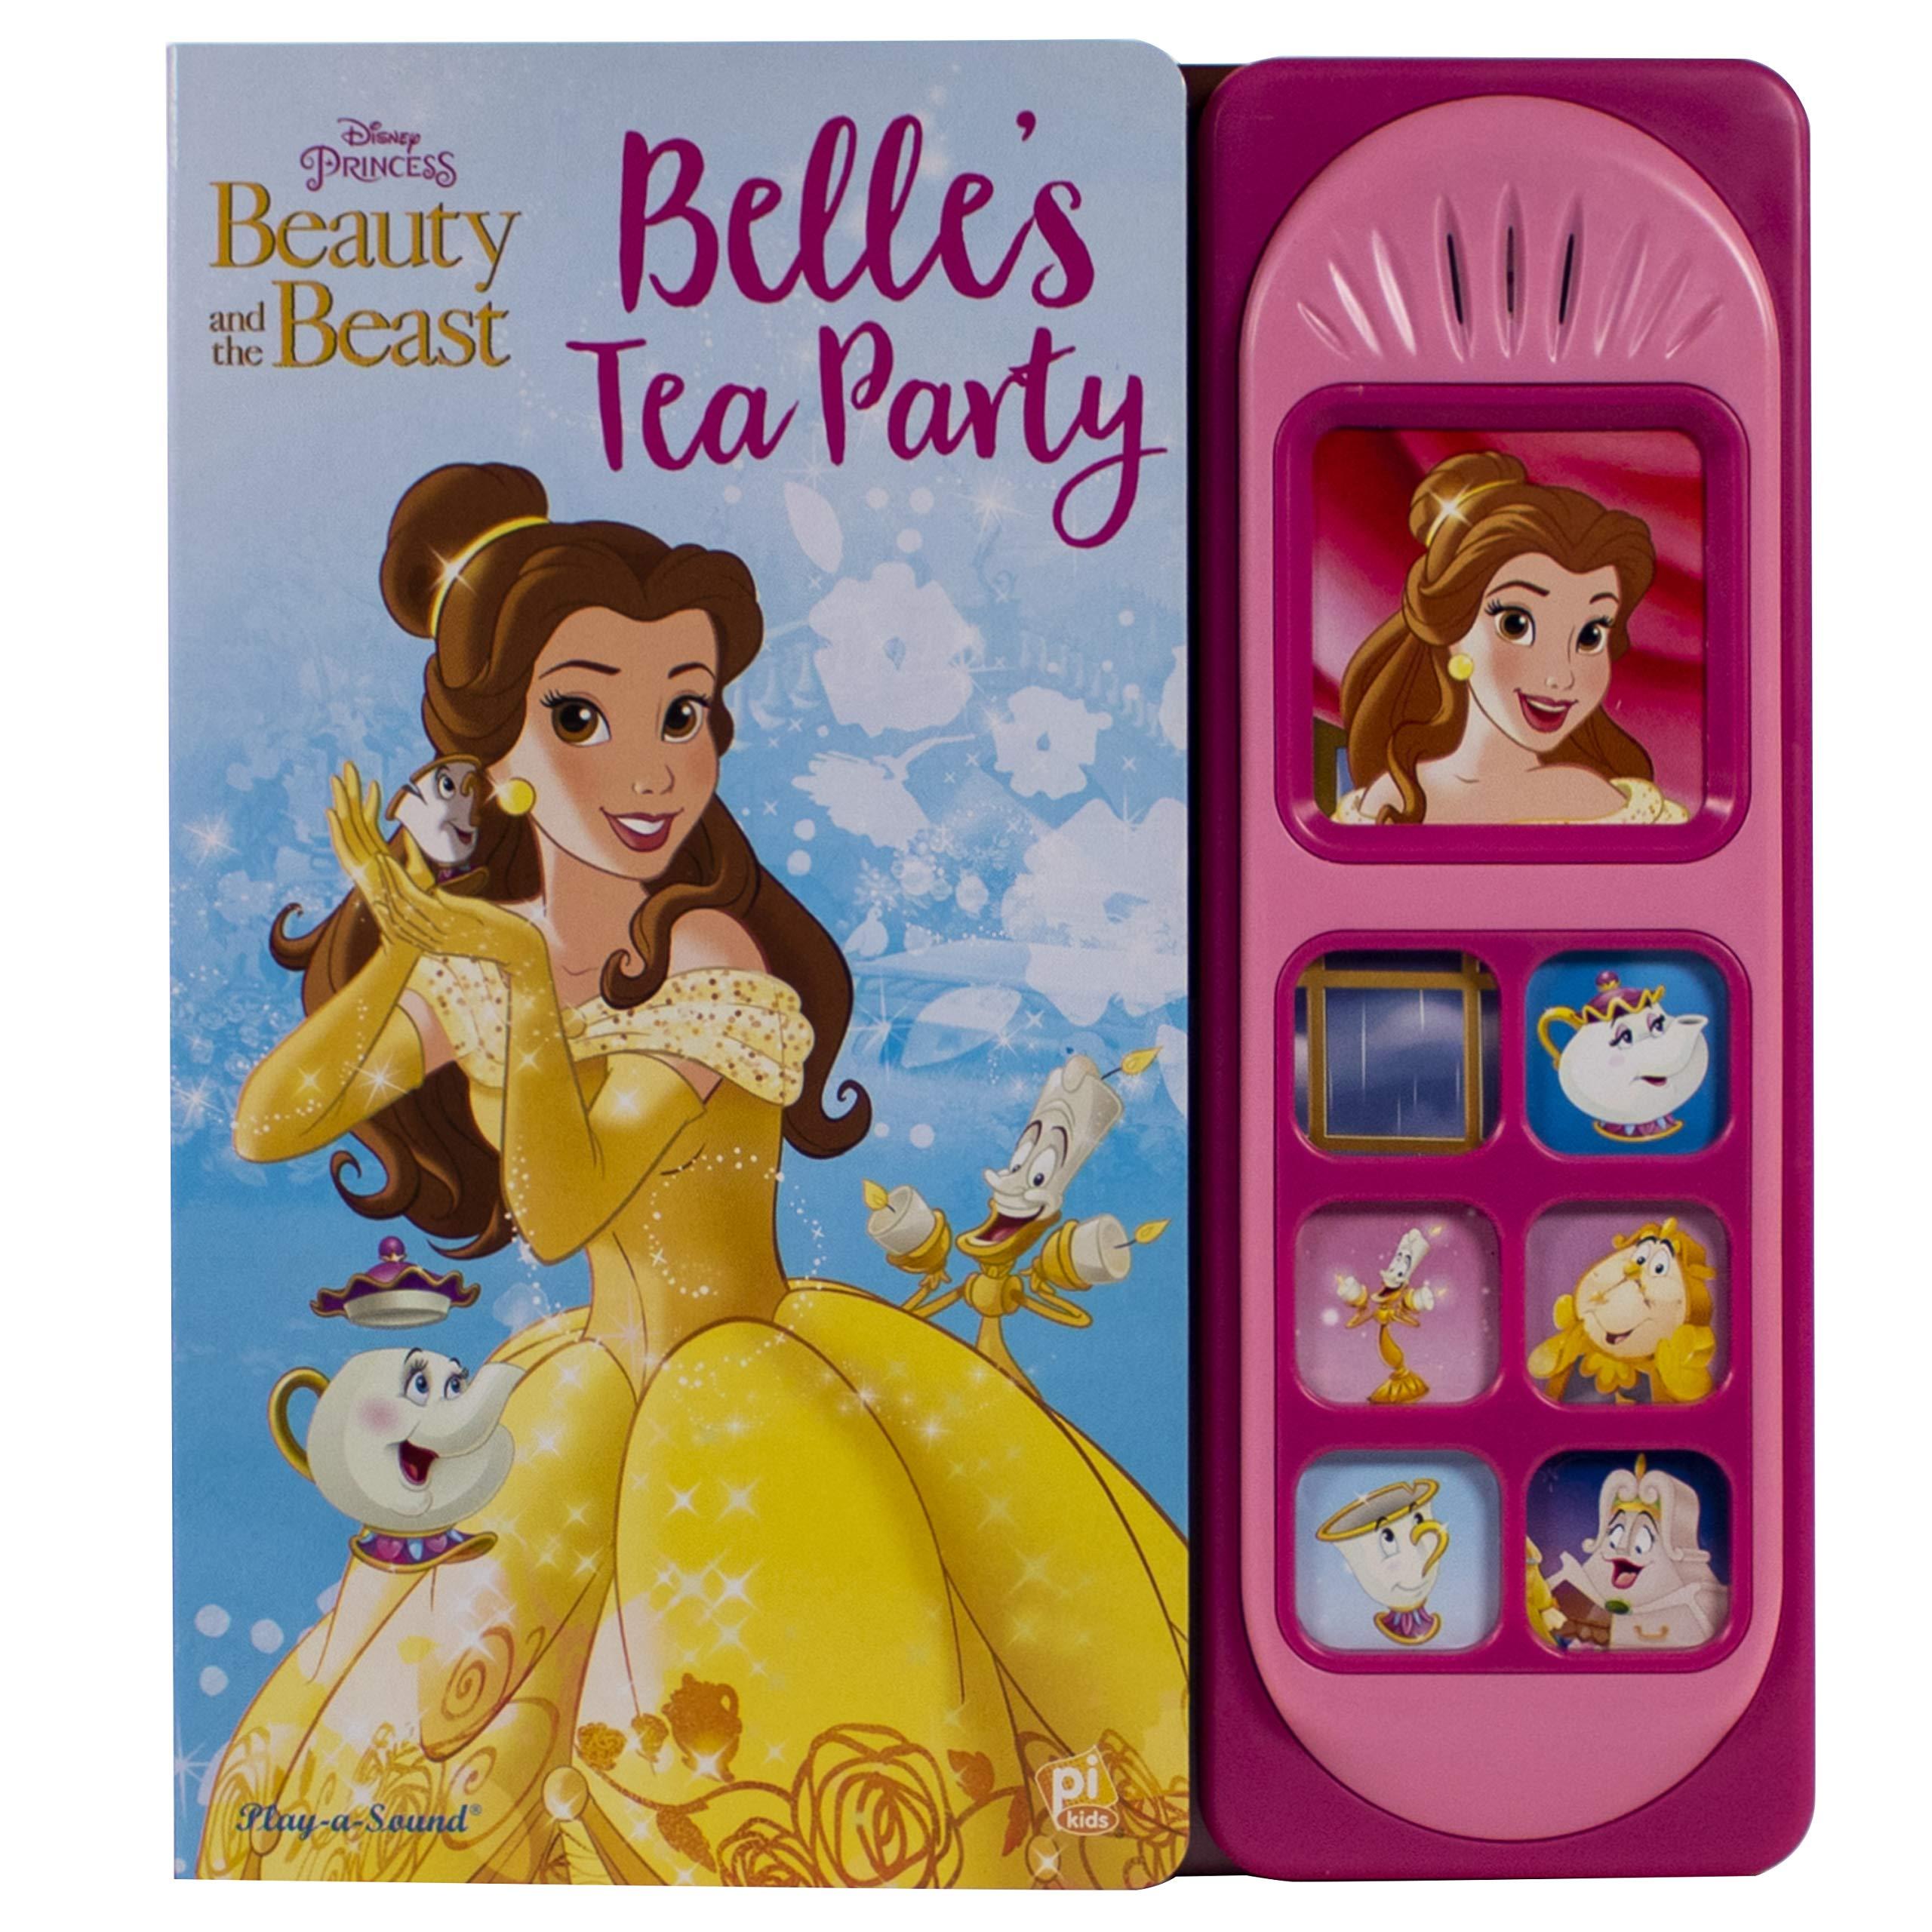 Disney Princess Beauty And The Beast Belle S Tea Party Little Sound Book Pi Kids Oliver Bieber Editors Of Phoenix International Publications Disney Storybook Art Team Disney Storybook Art Team 9781503732735